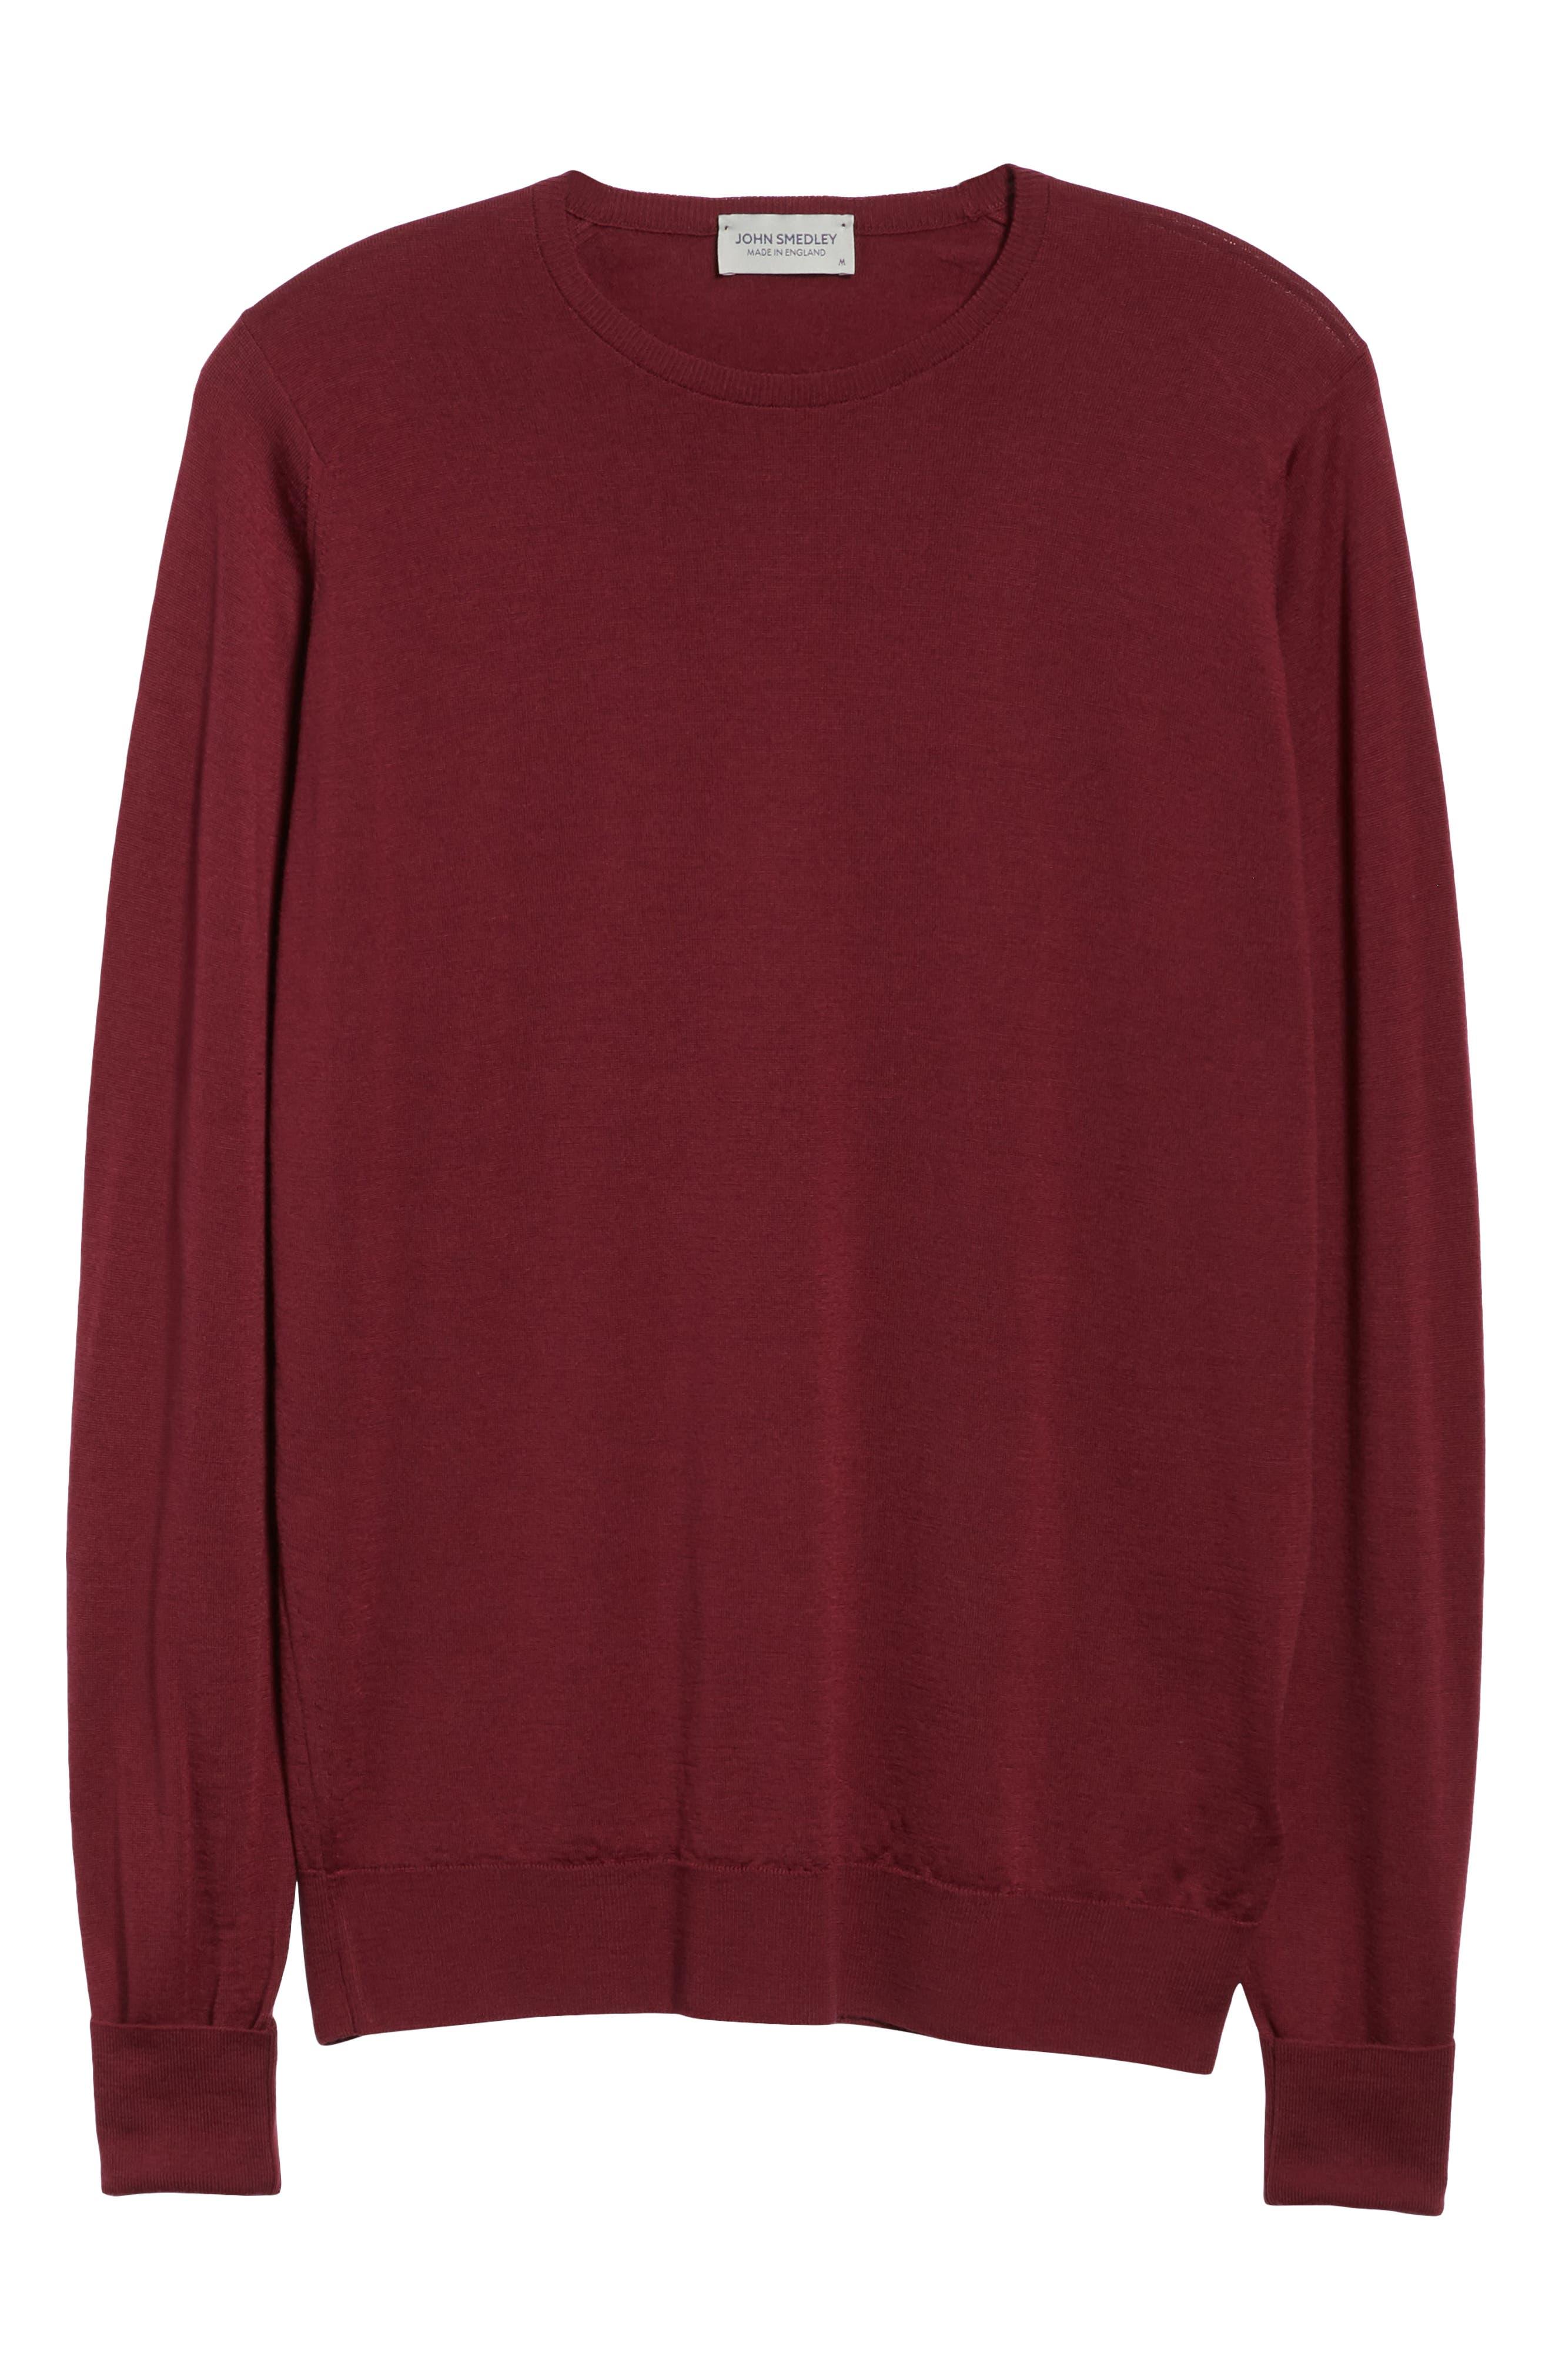 'Marcus' Easy Fit Crewneck Wool Sweater,                             Alternate thumbnail 6, color,                             BOREDAUX